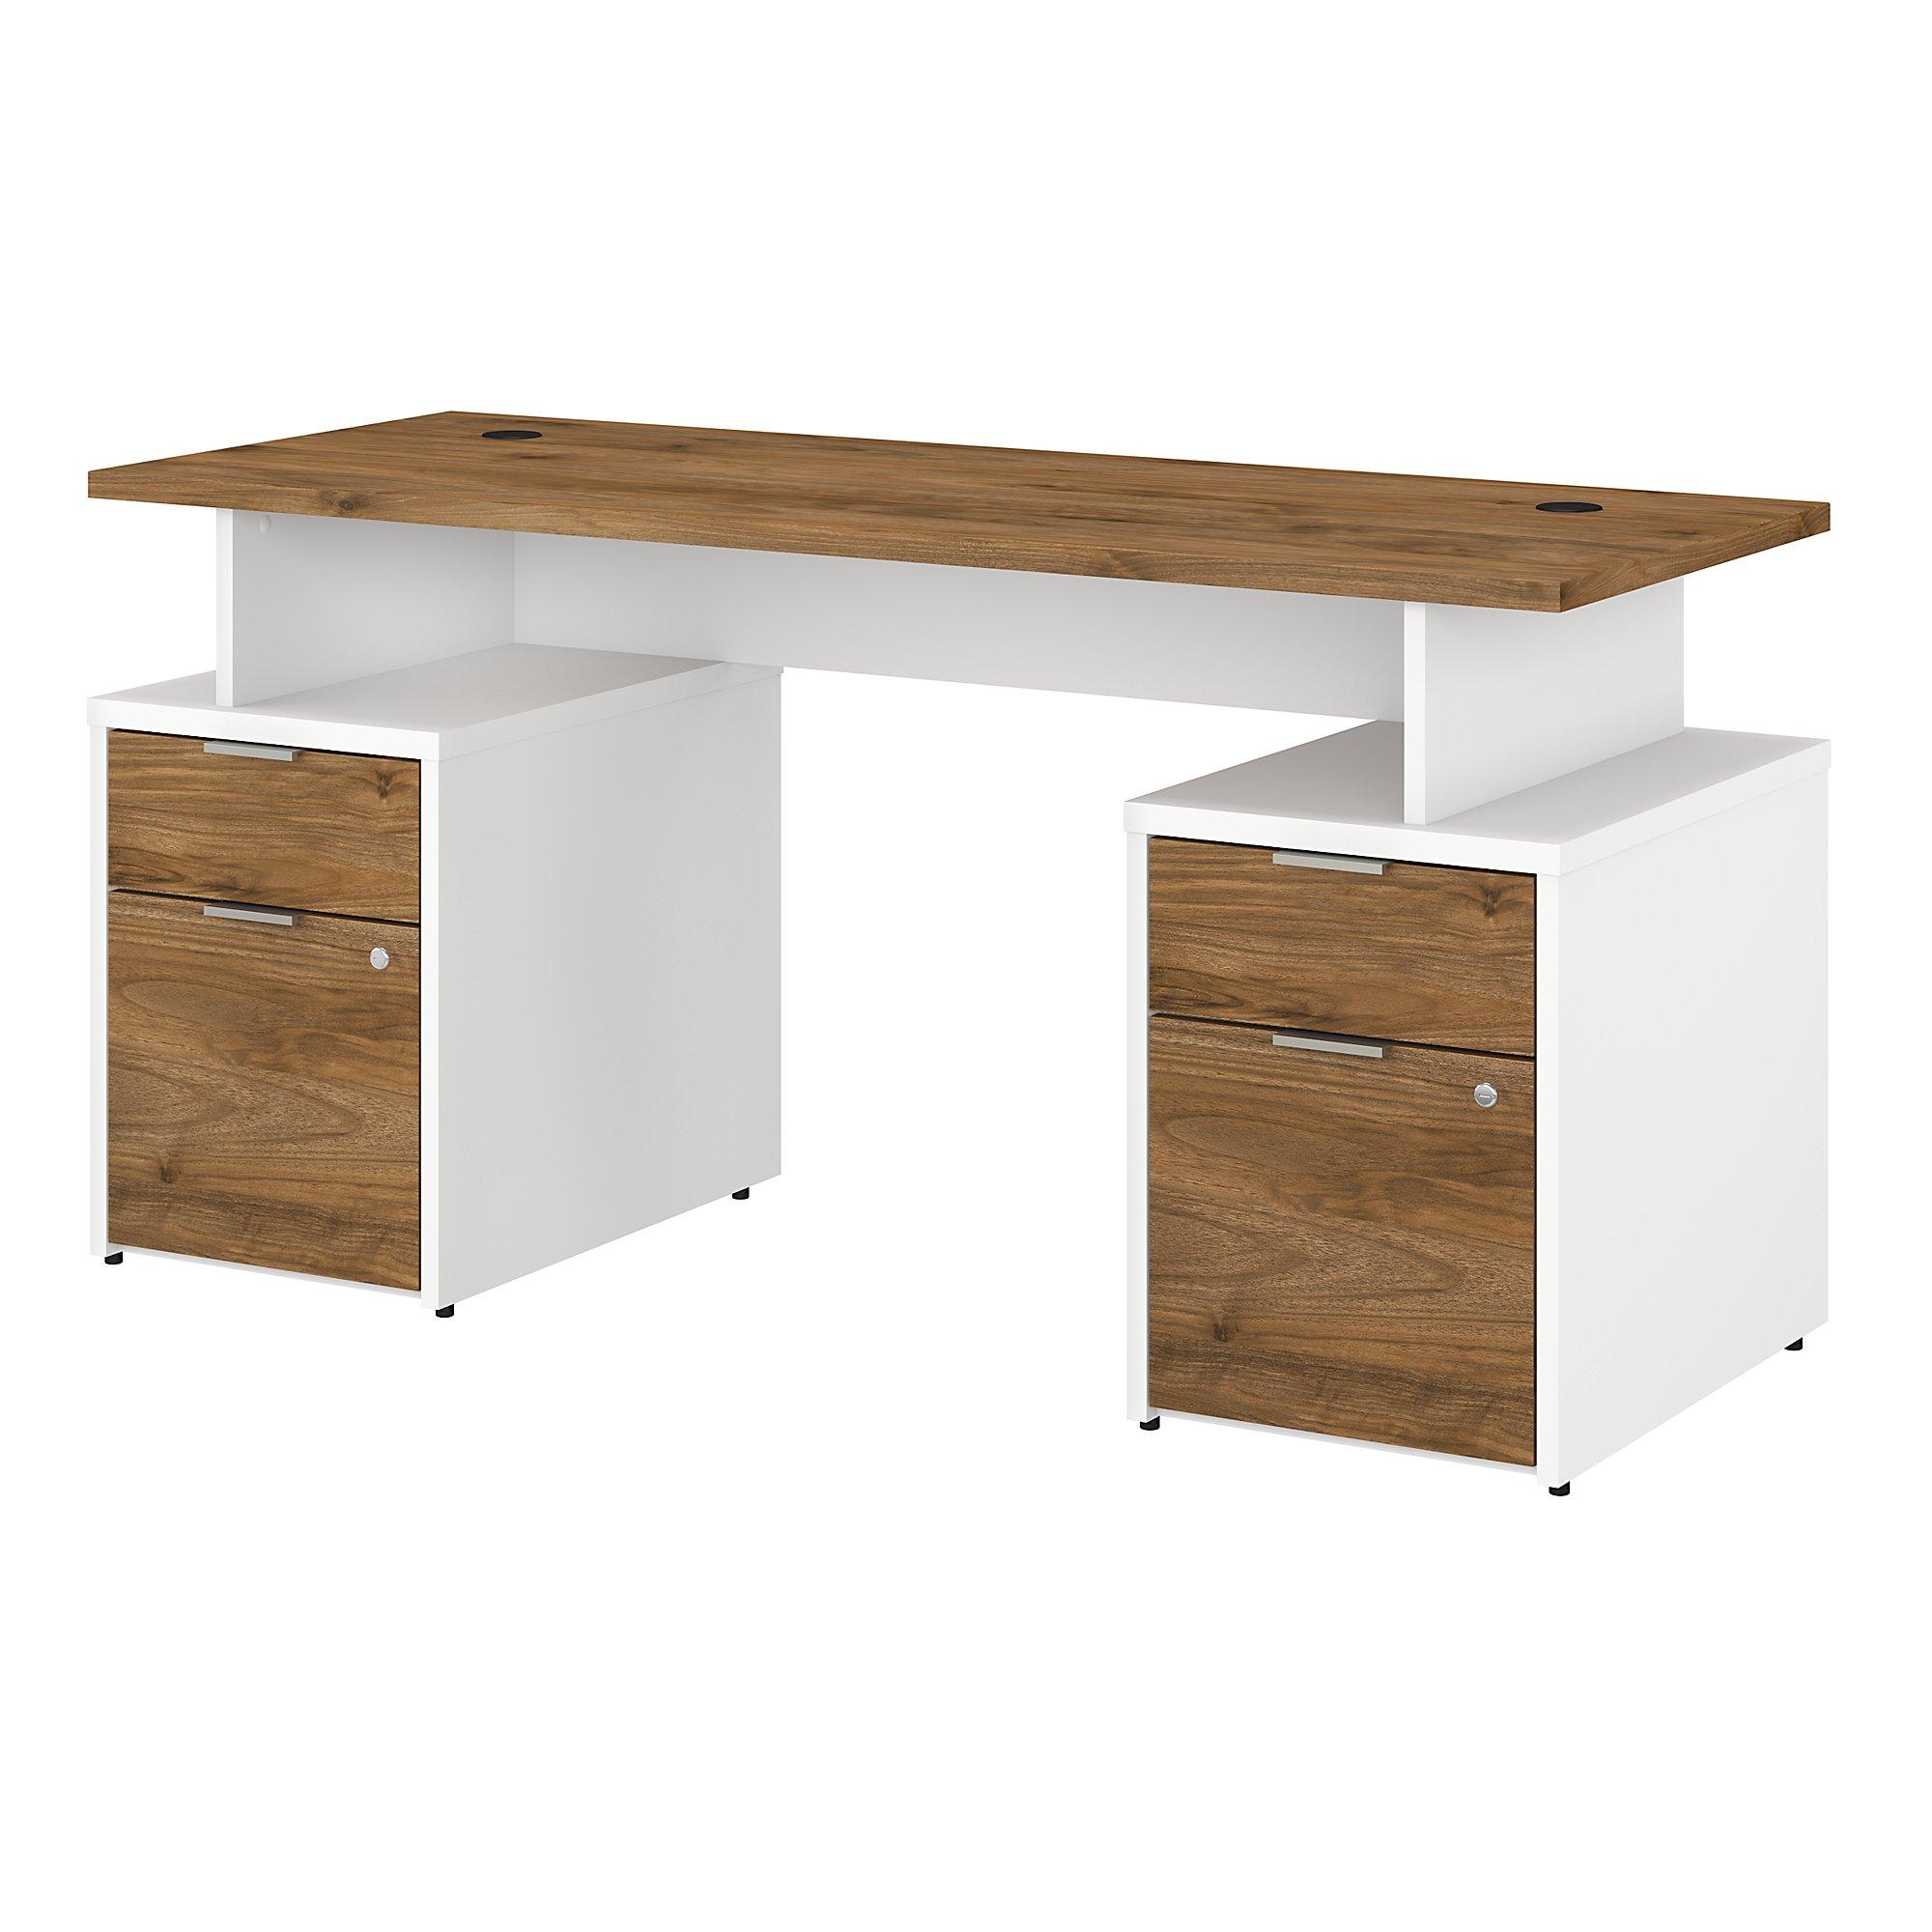 jtn017 fresh walnut and white jamestown double pedestal desk